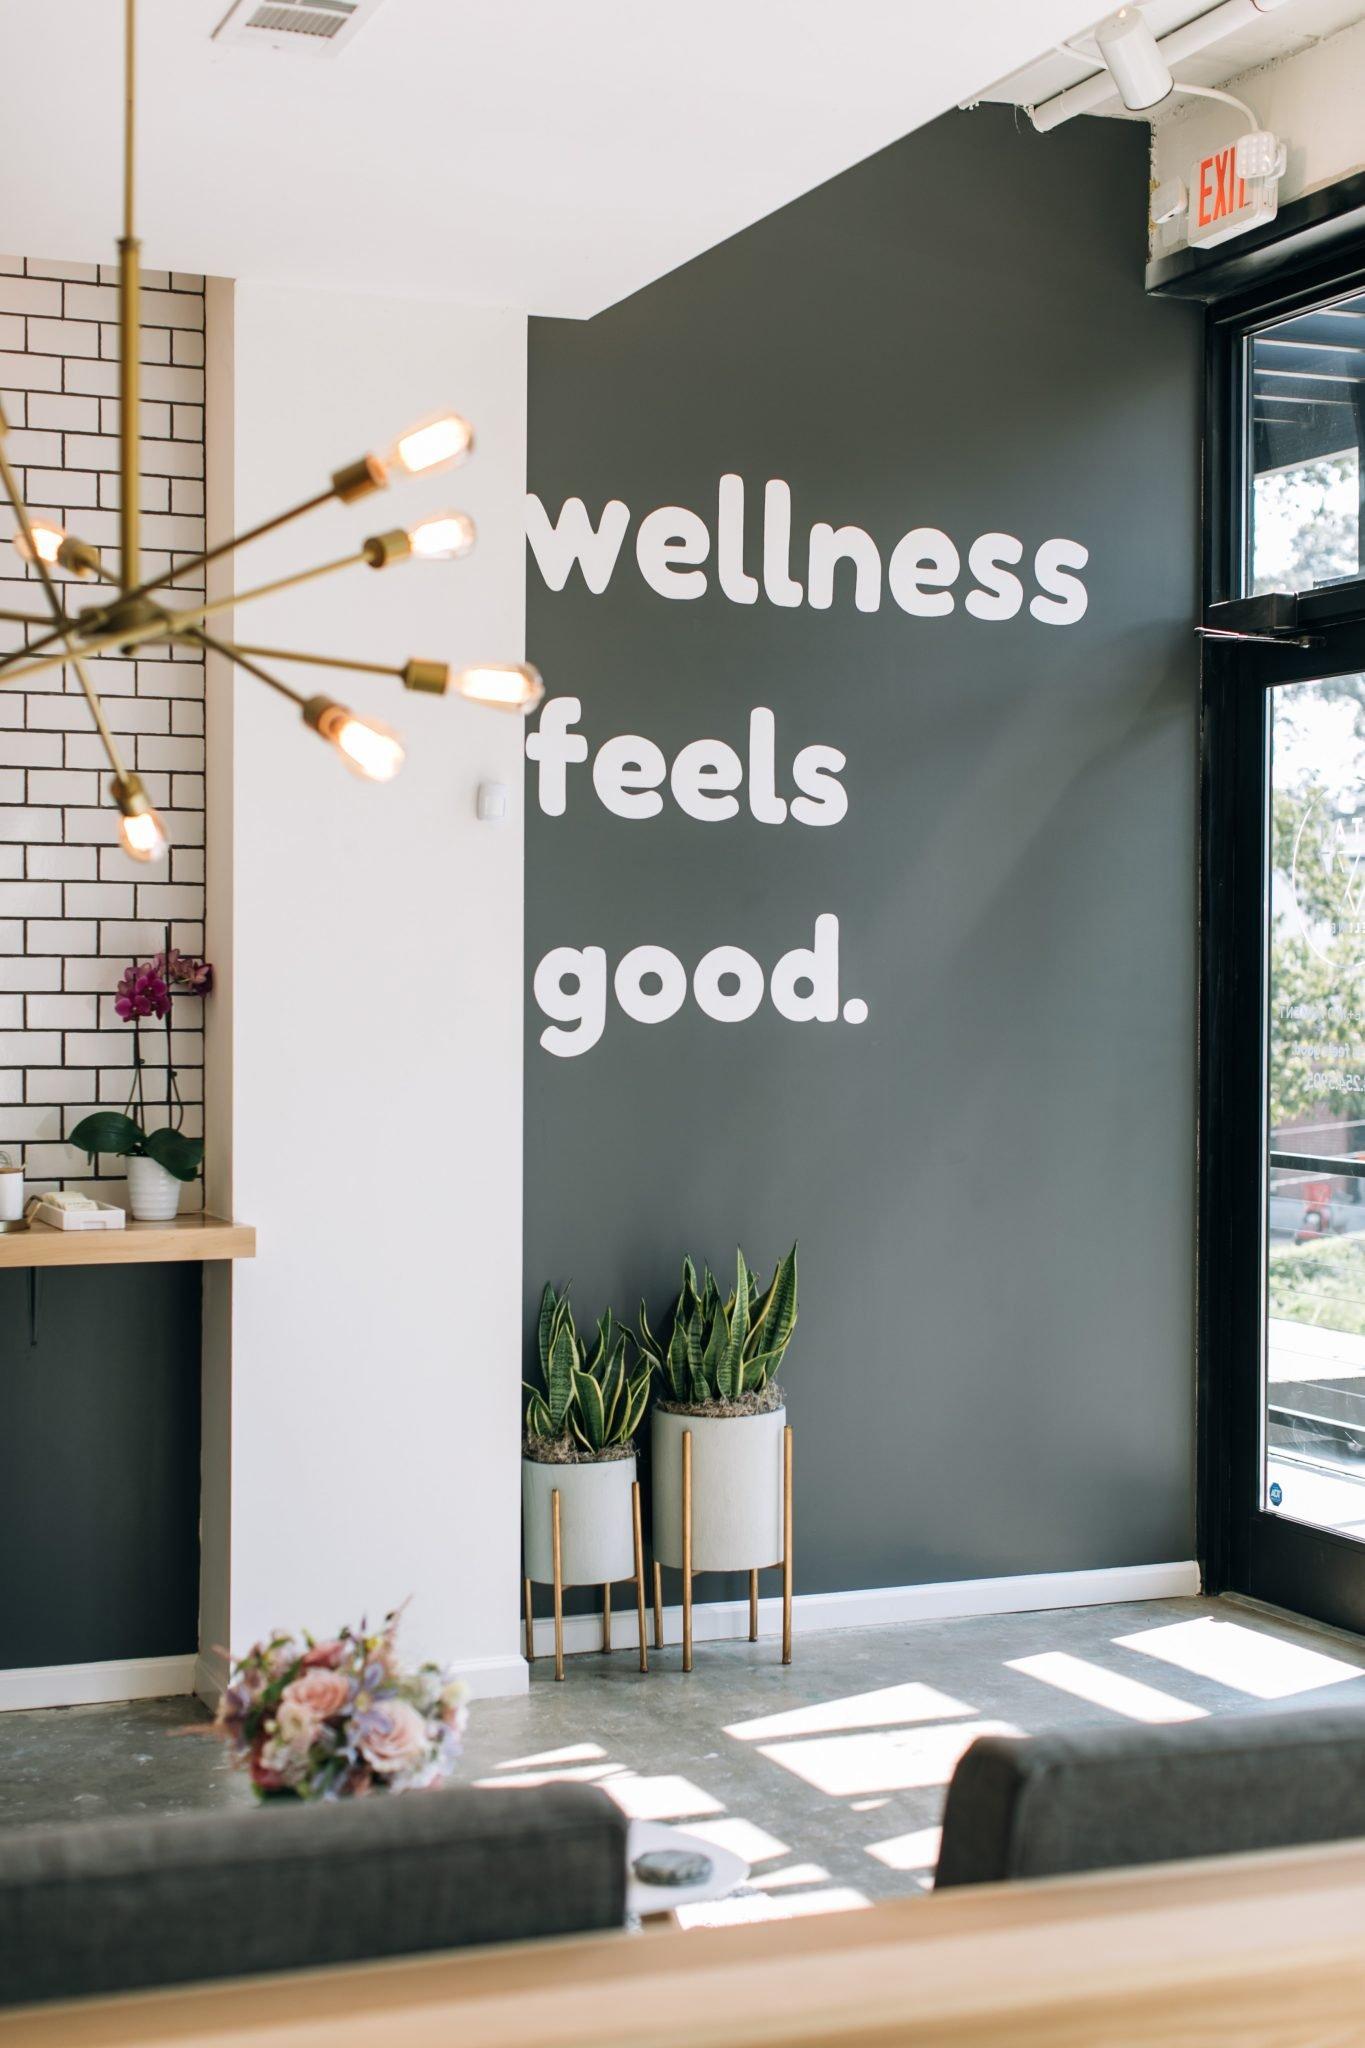 wellness-feels-good-mural